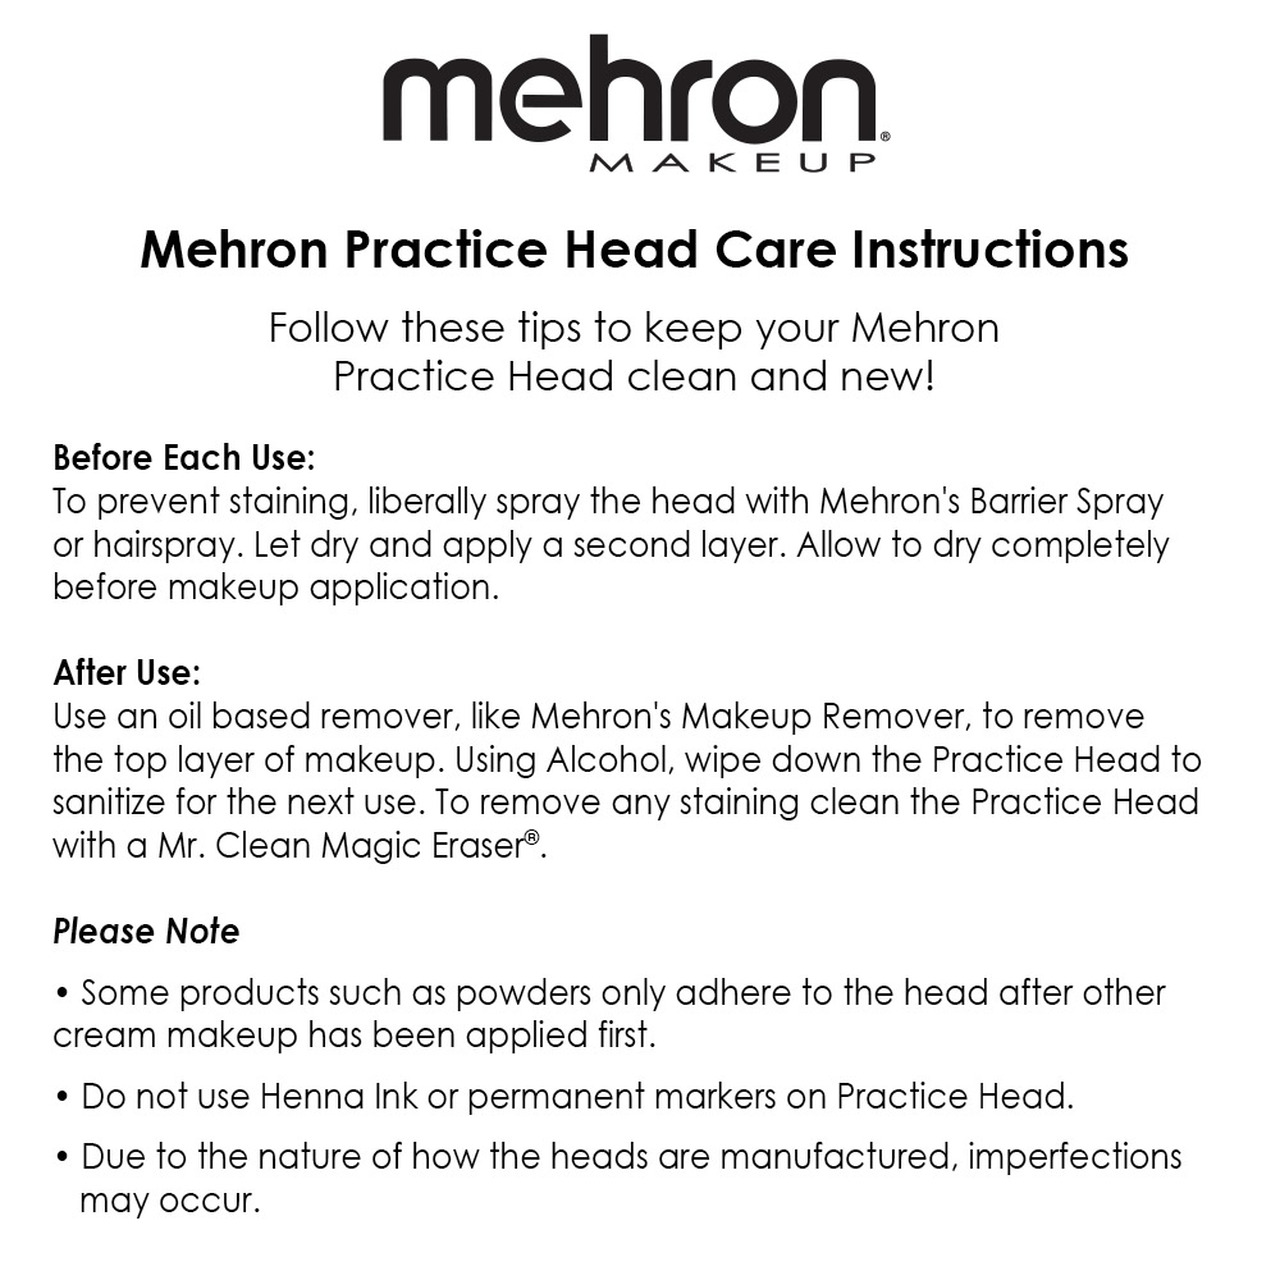 HEAD_infographic_instructions.jpg